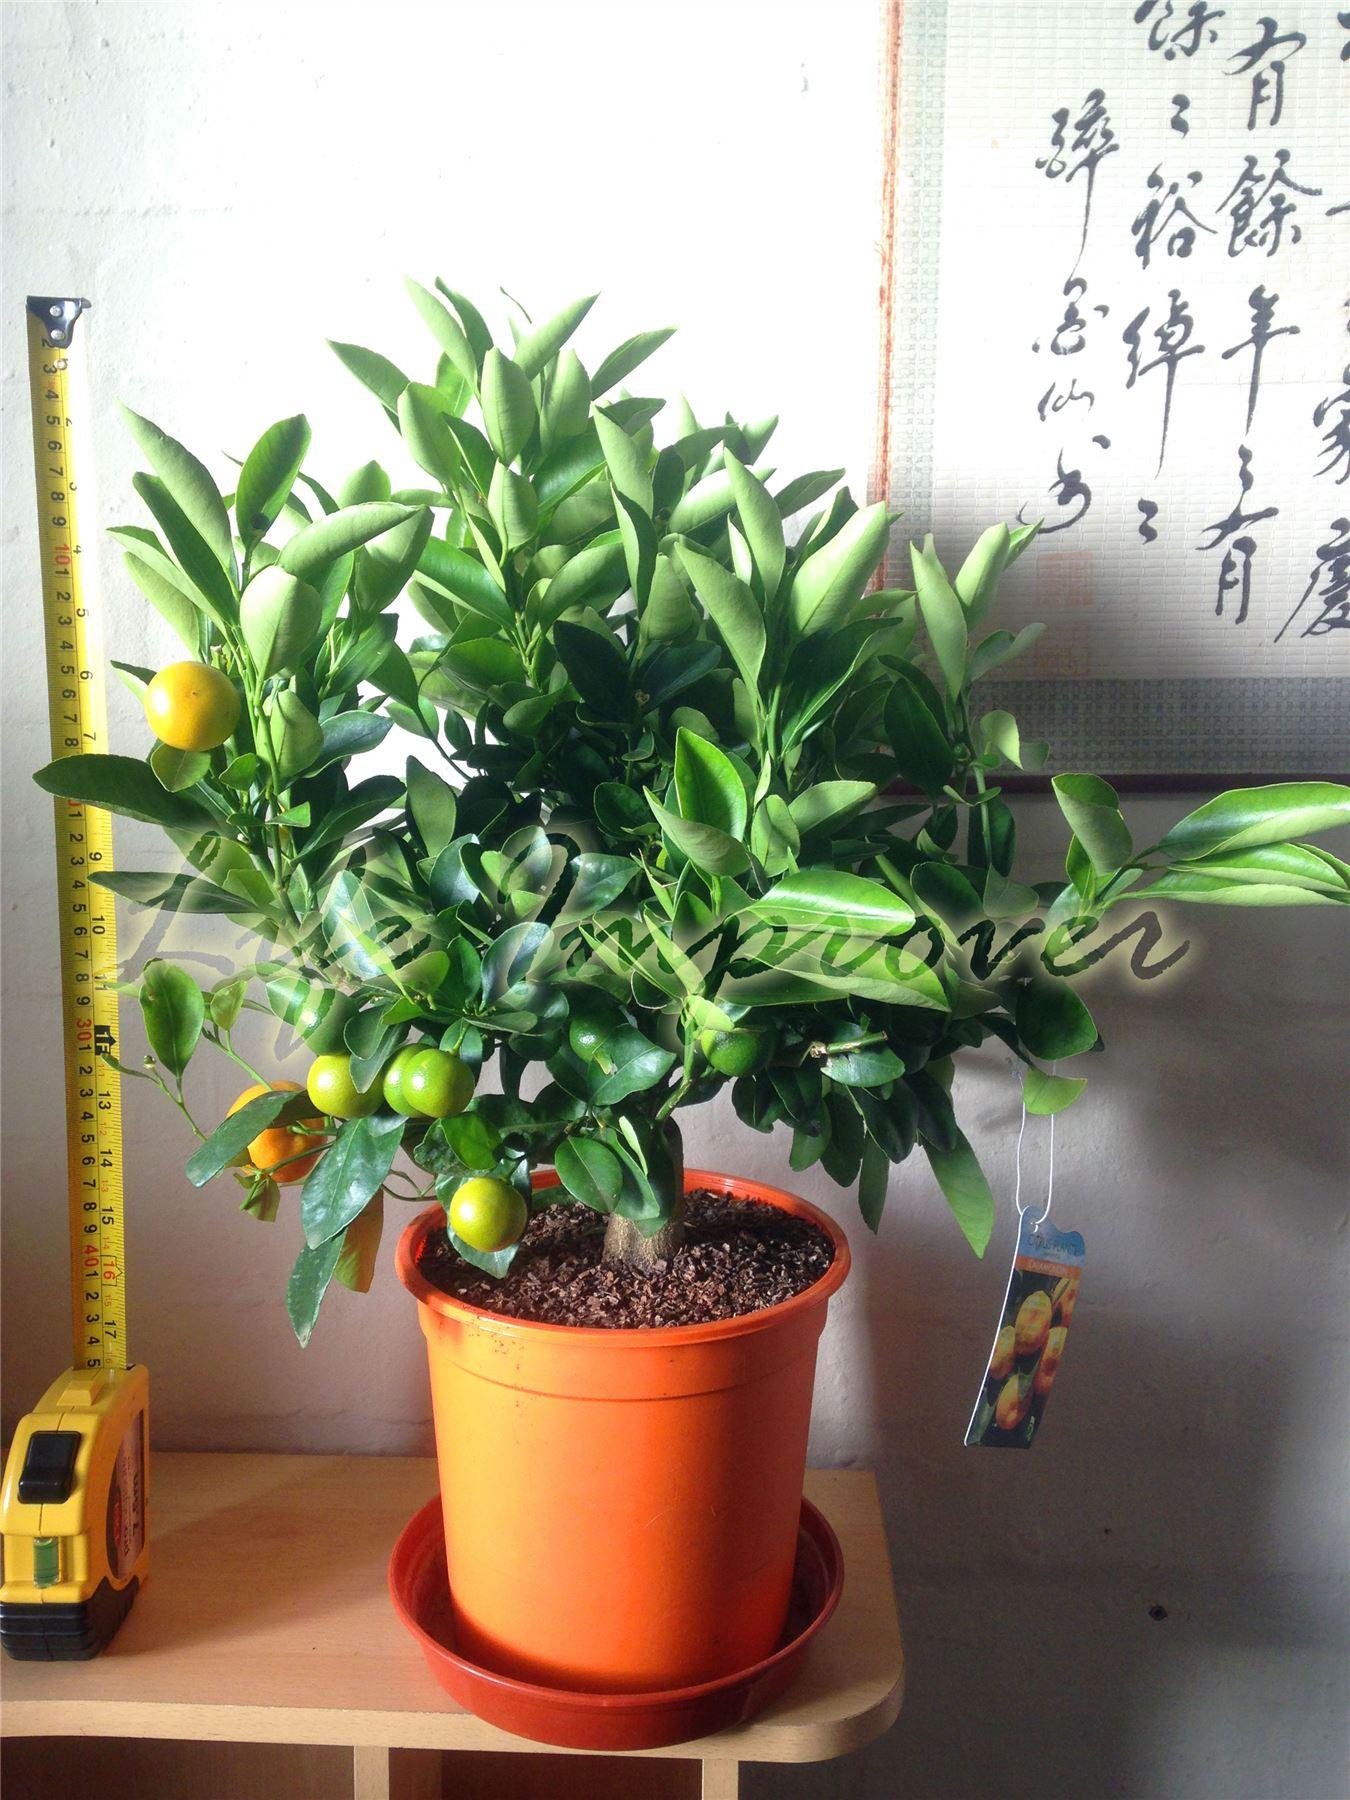 1 nain permanent calamondin agrumes orange fruit arbre plante en pot int rieure ebay - Agrumes en pot ...